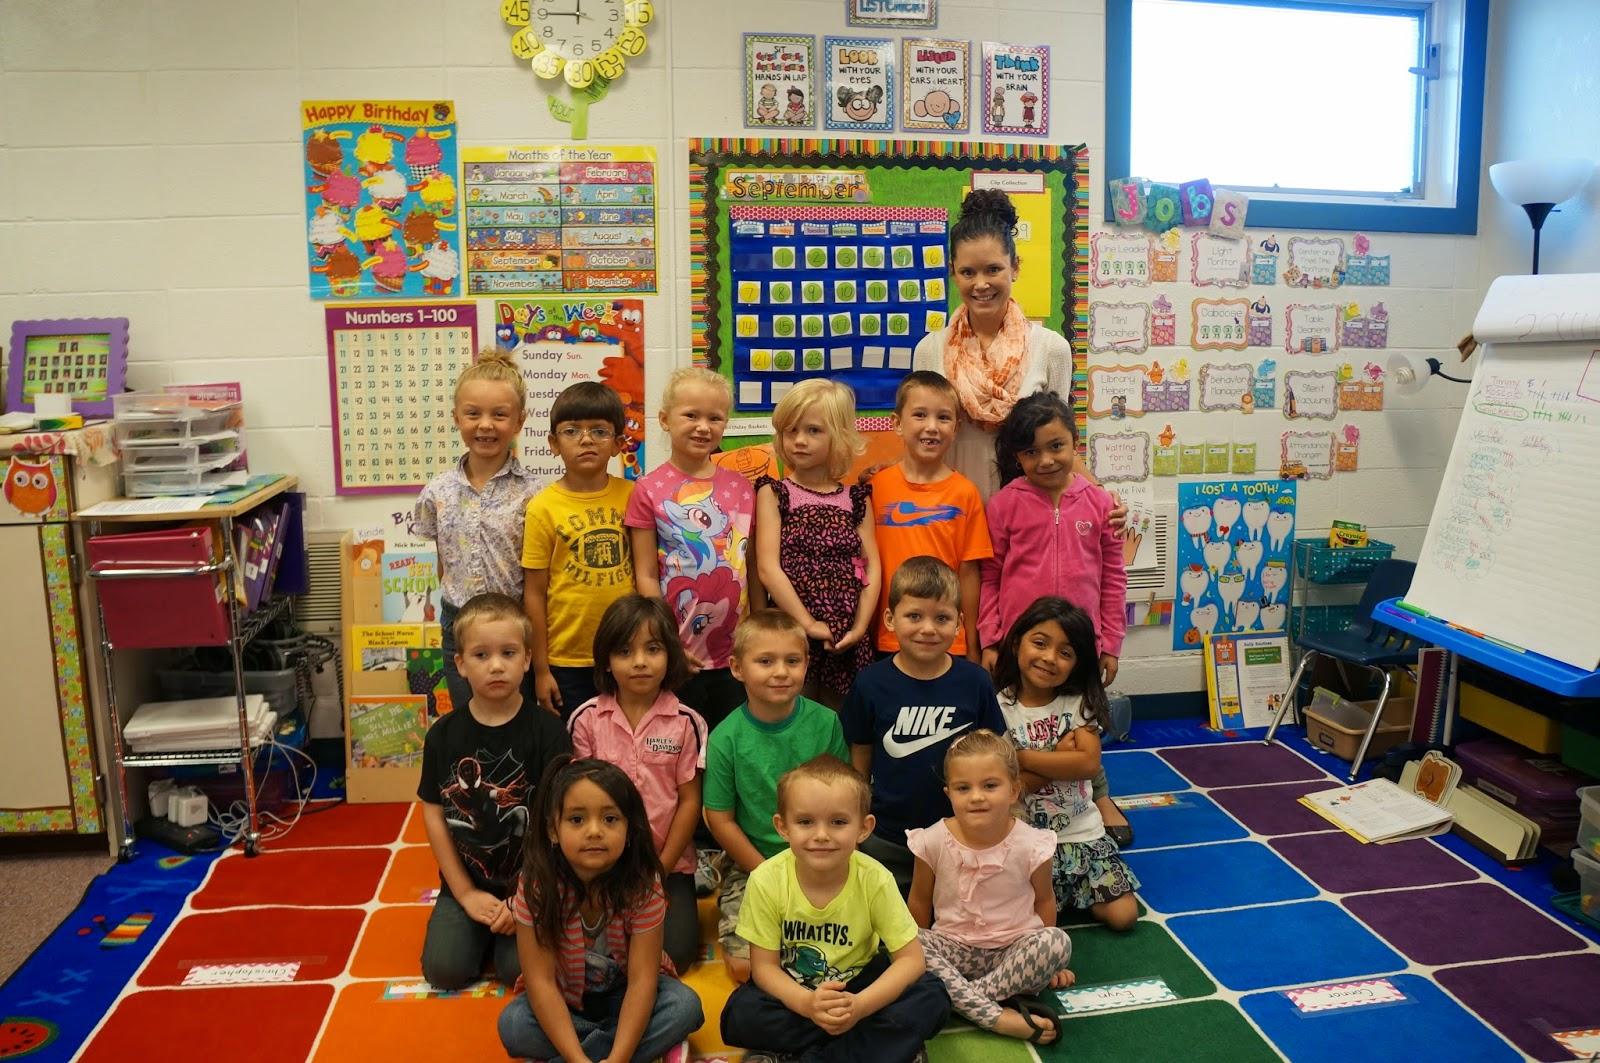 Kindergarten Class: Miss Soto's Kindergarten Class